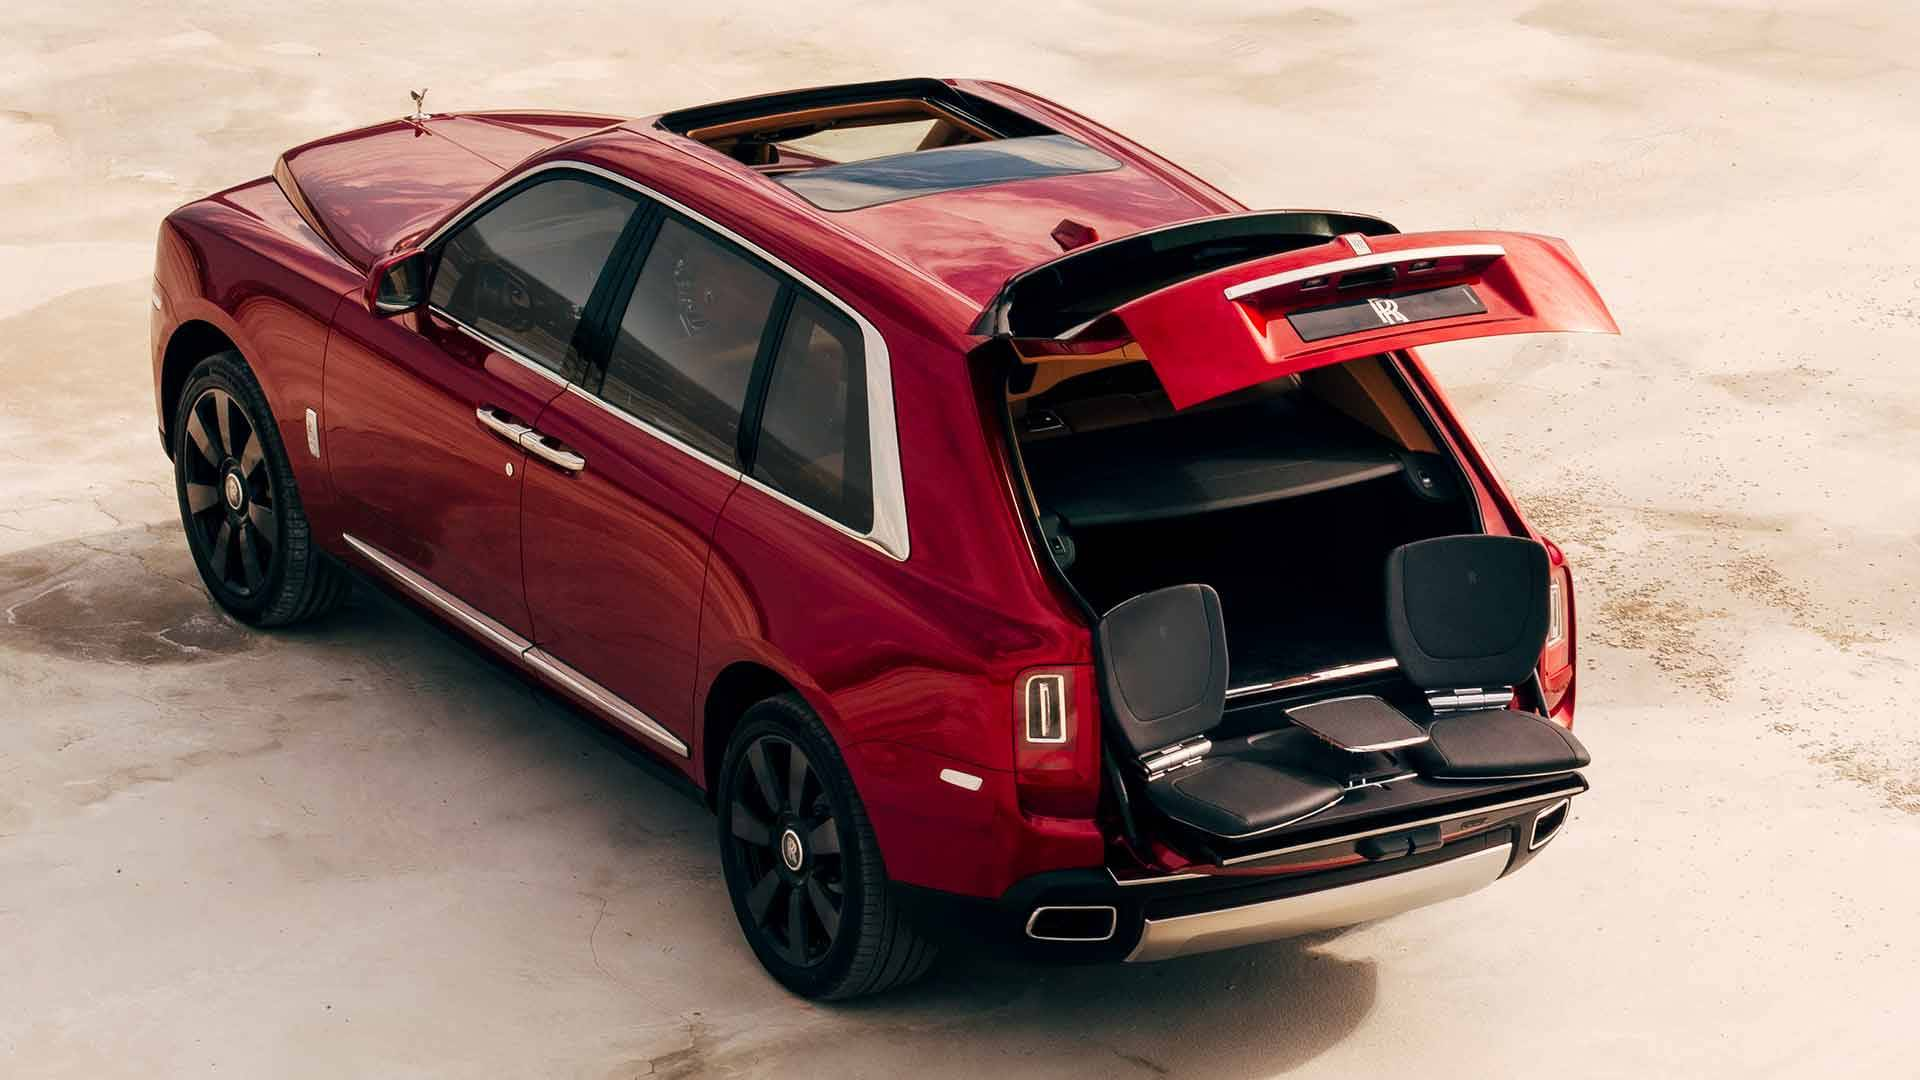 Rolls Royce Cullinan Rear Quarter 1 Forcegt Com